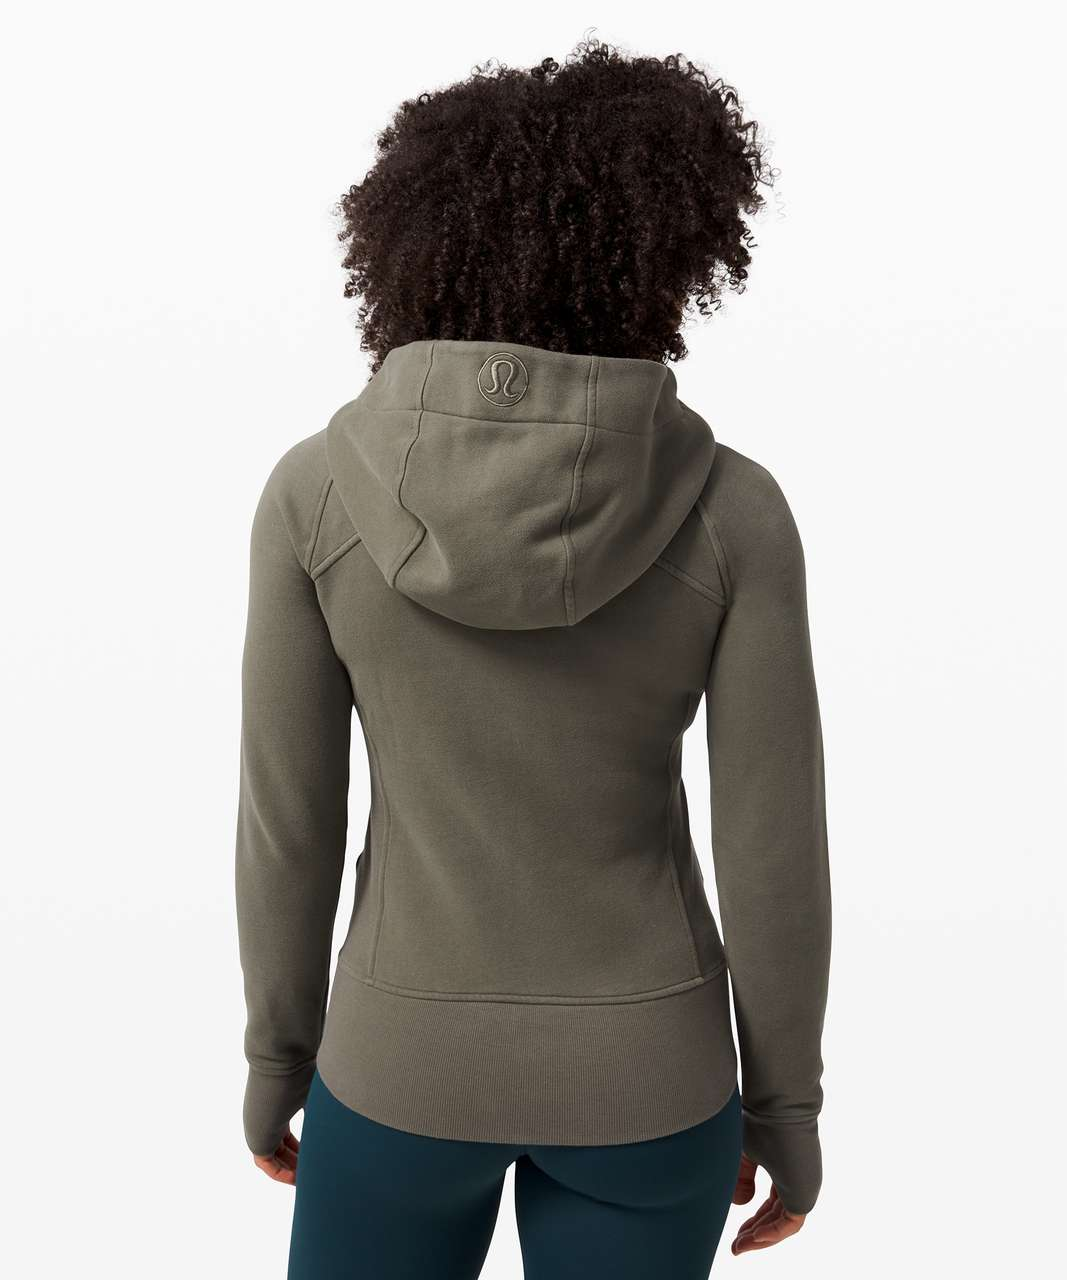 Lululemon Scuba Hoodie *Light Cotton Fleece - Army Green